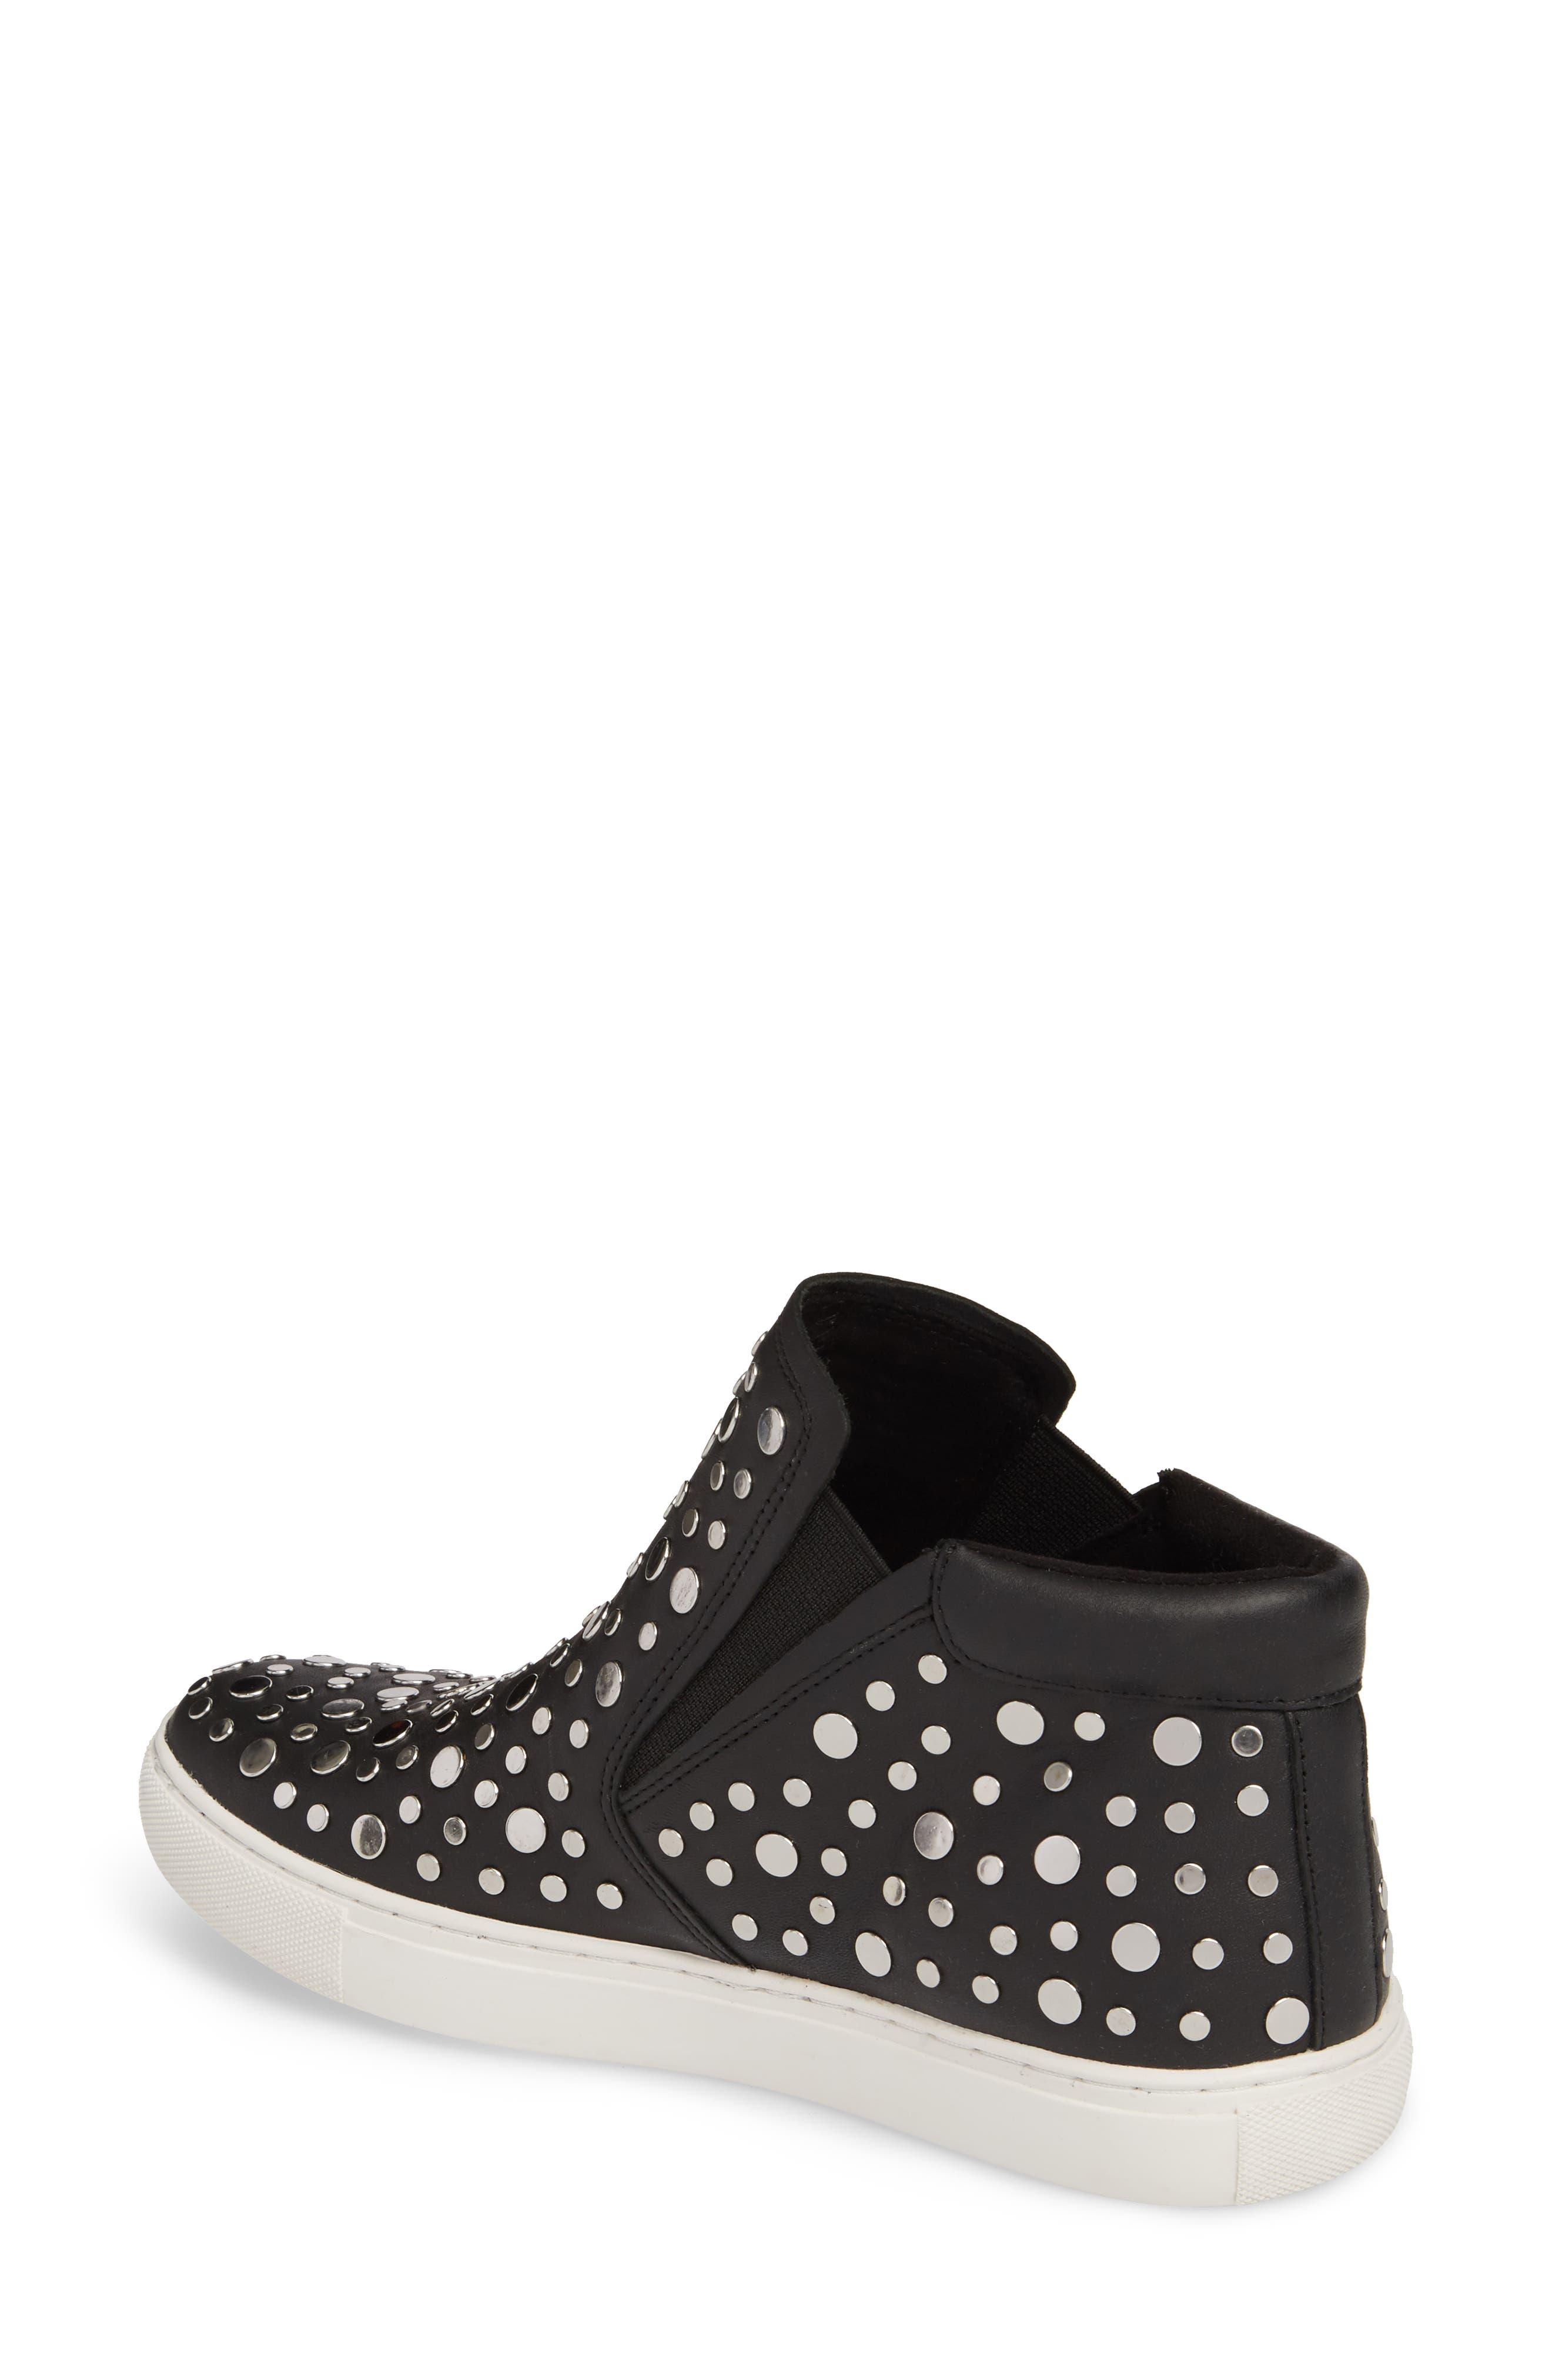 Kalvin Studded High Top Sneaker,                             Alternate thumbnail 2, color,                             Black Leather